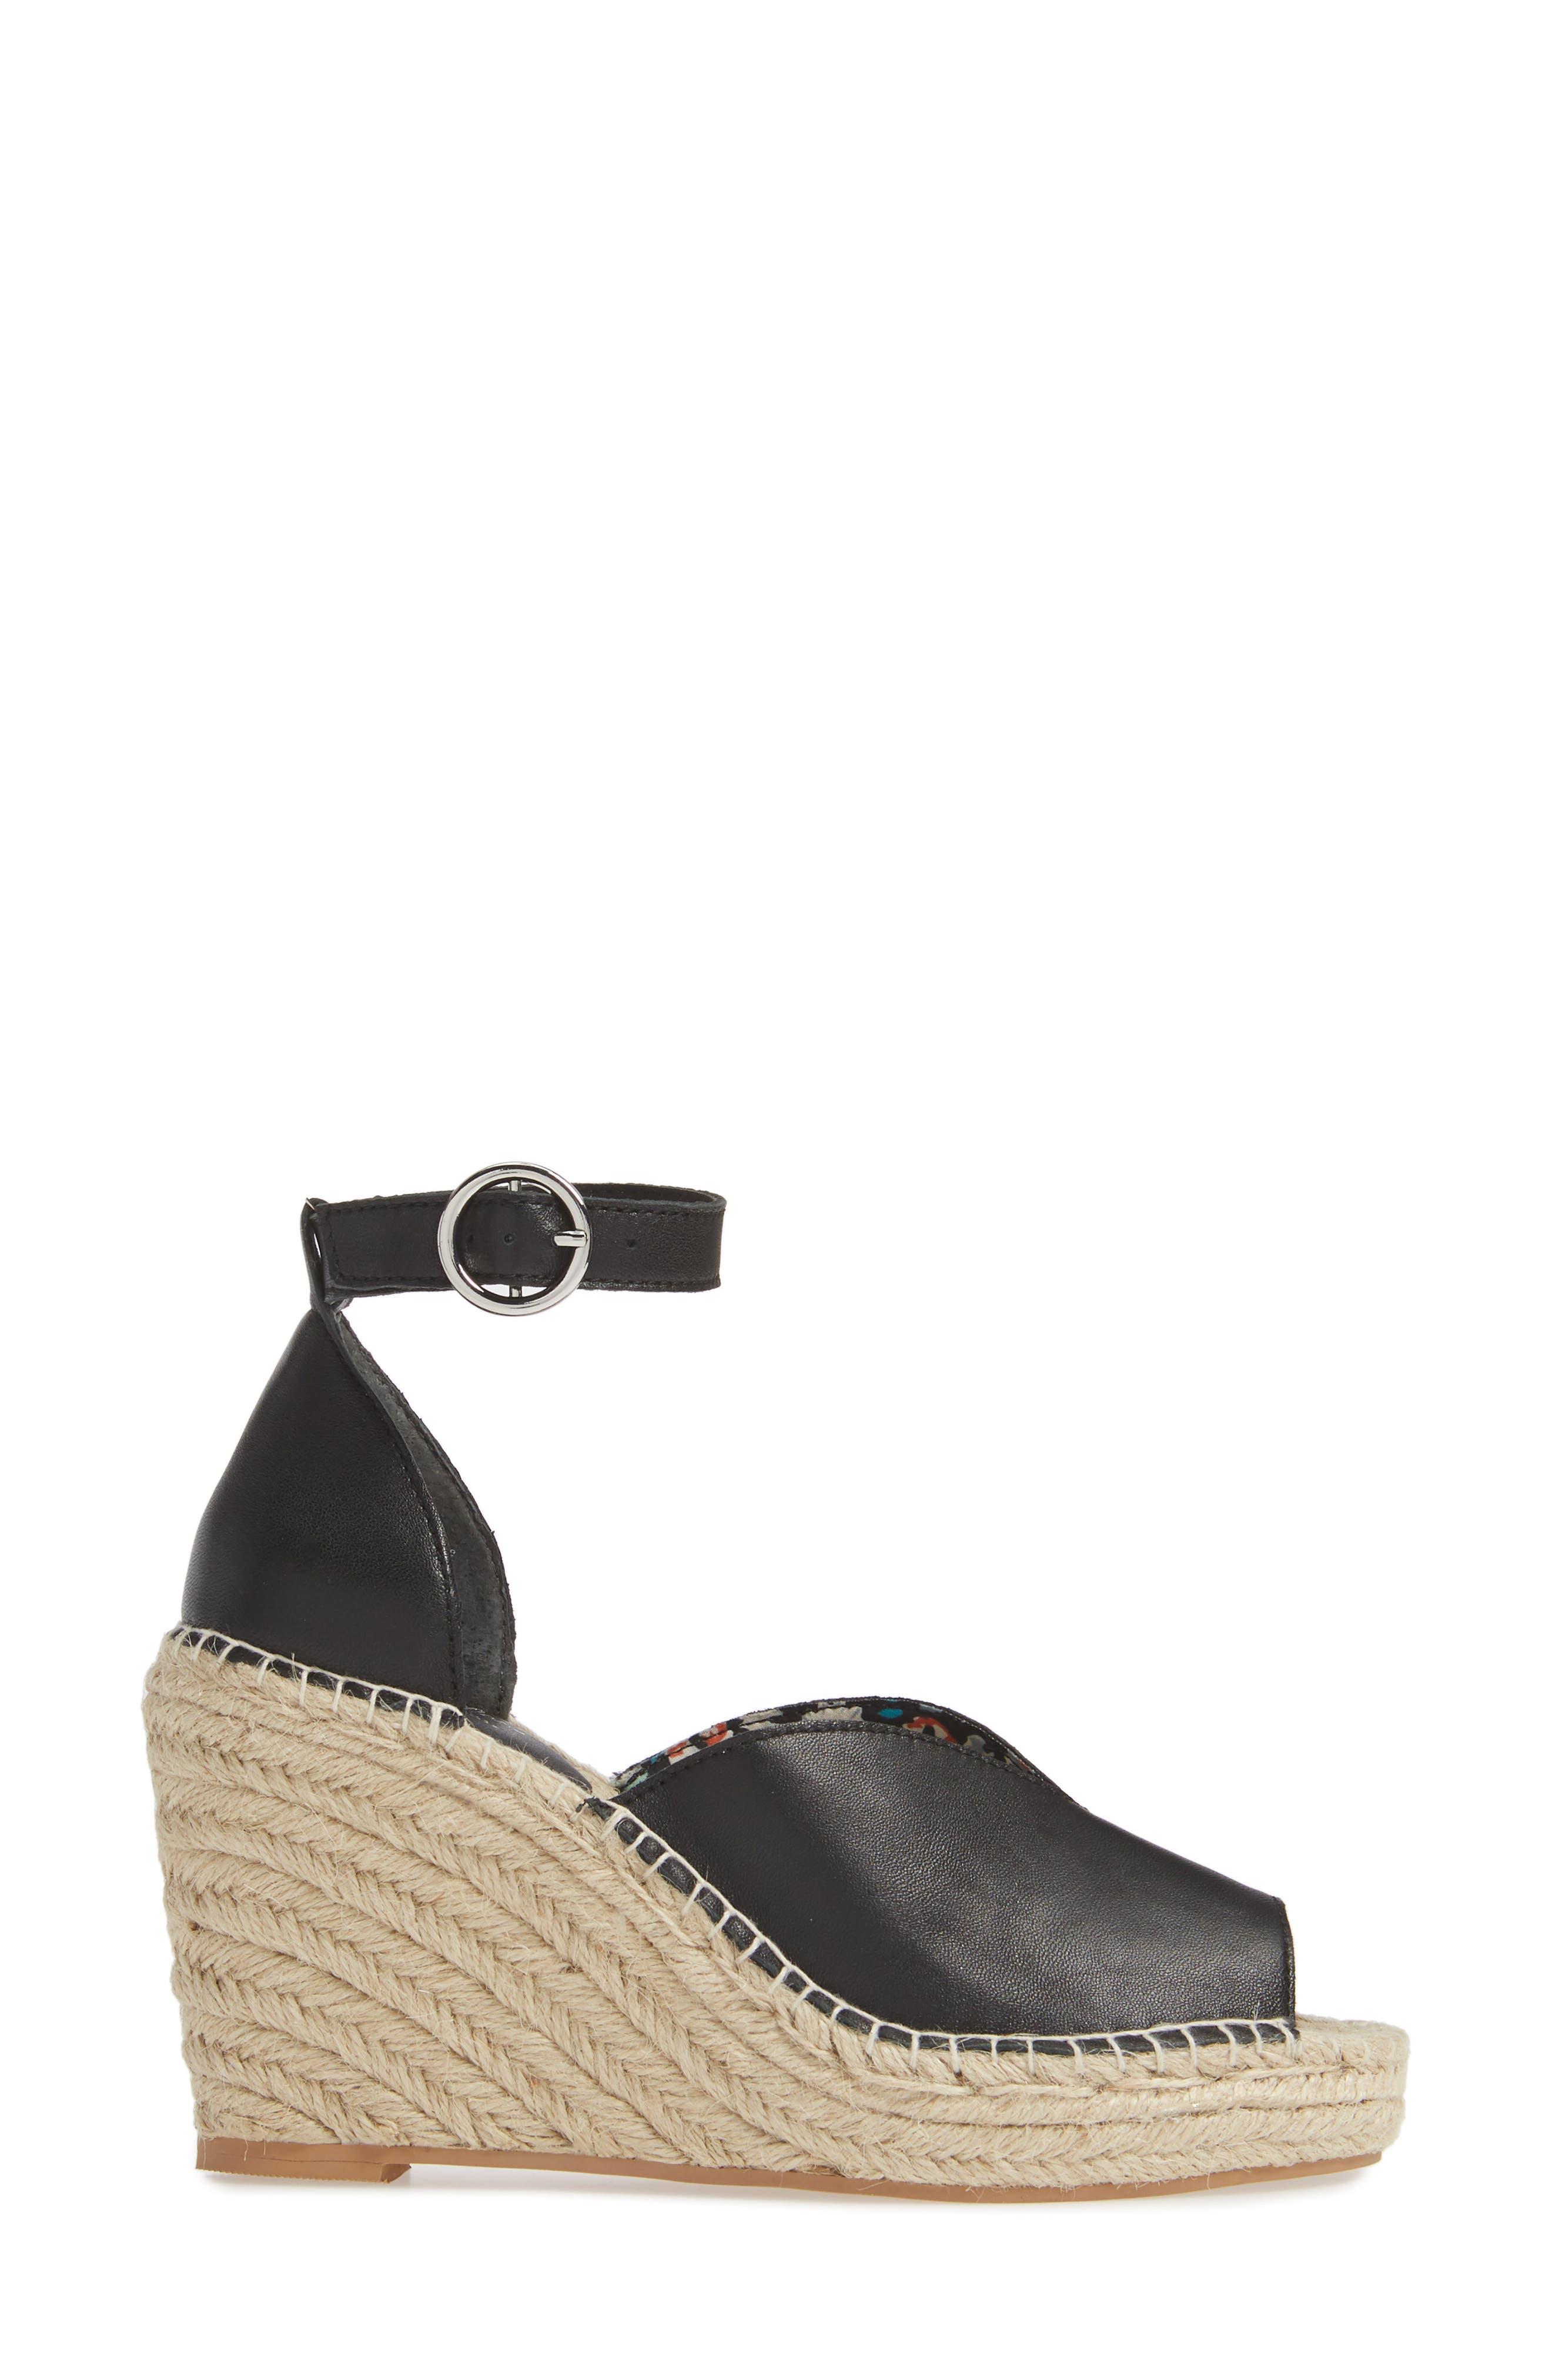 SEYCHELLES, Collectibles Espadrille Wedge Sandal, Alternate thumbnail 3, color, BLACK LEATHER